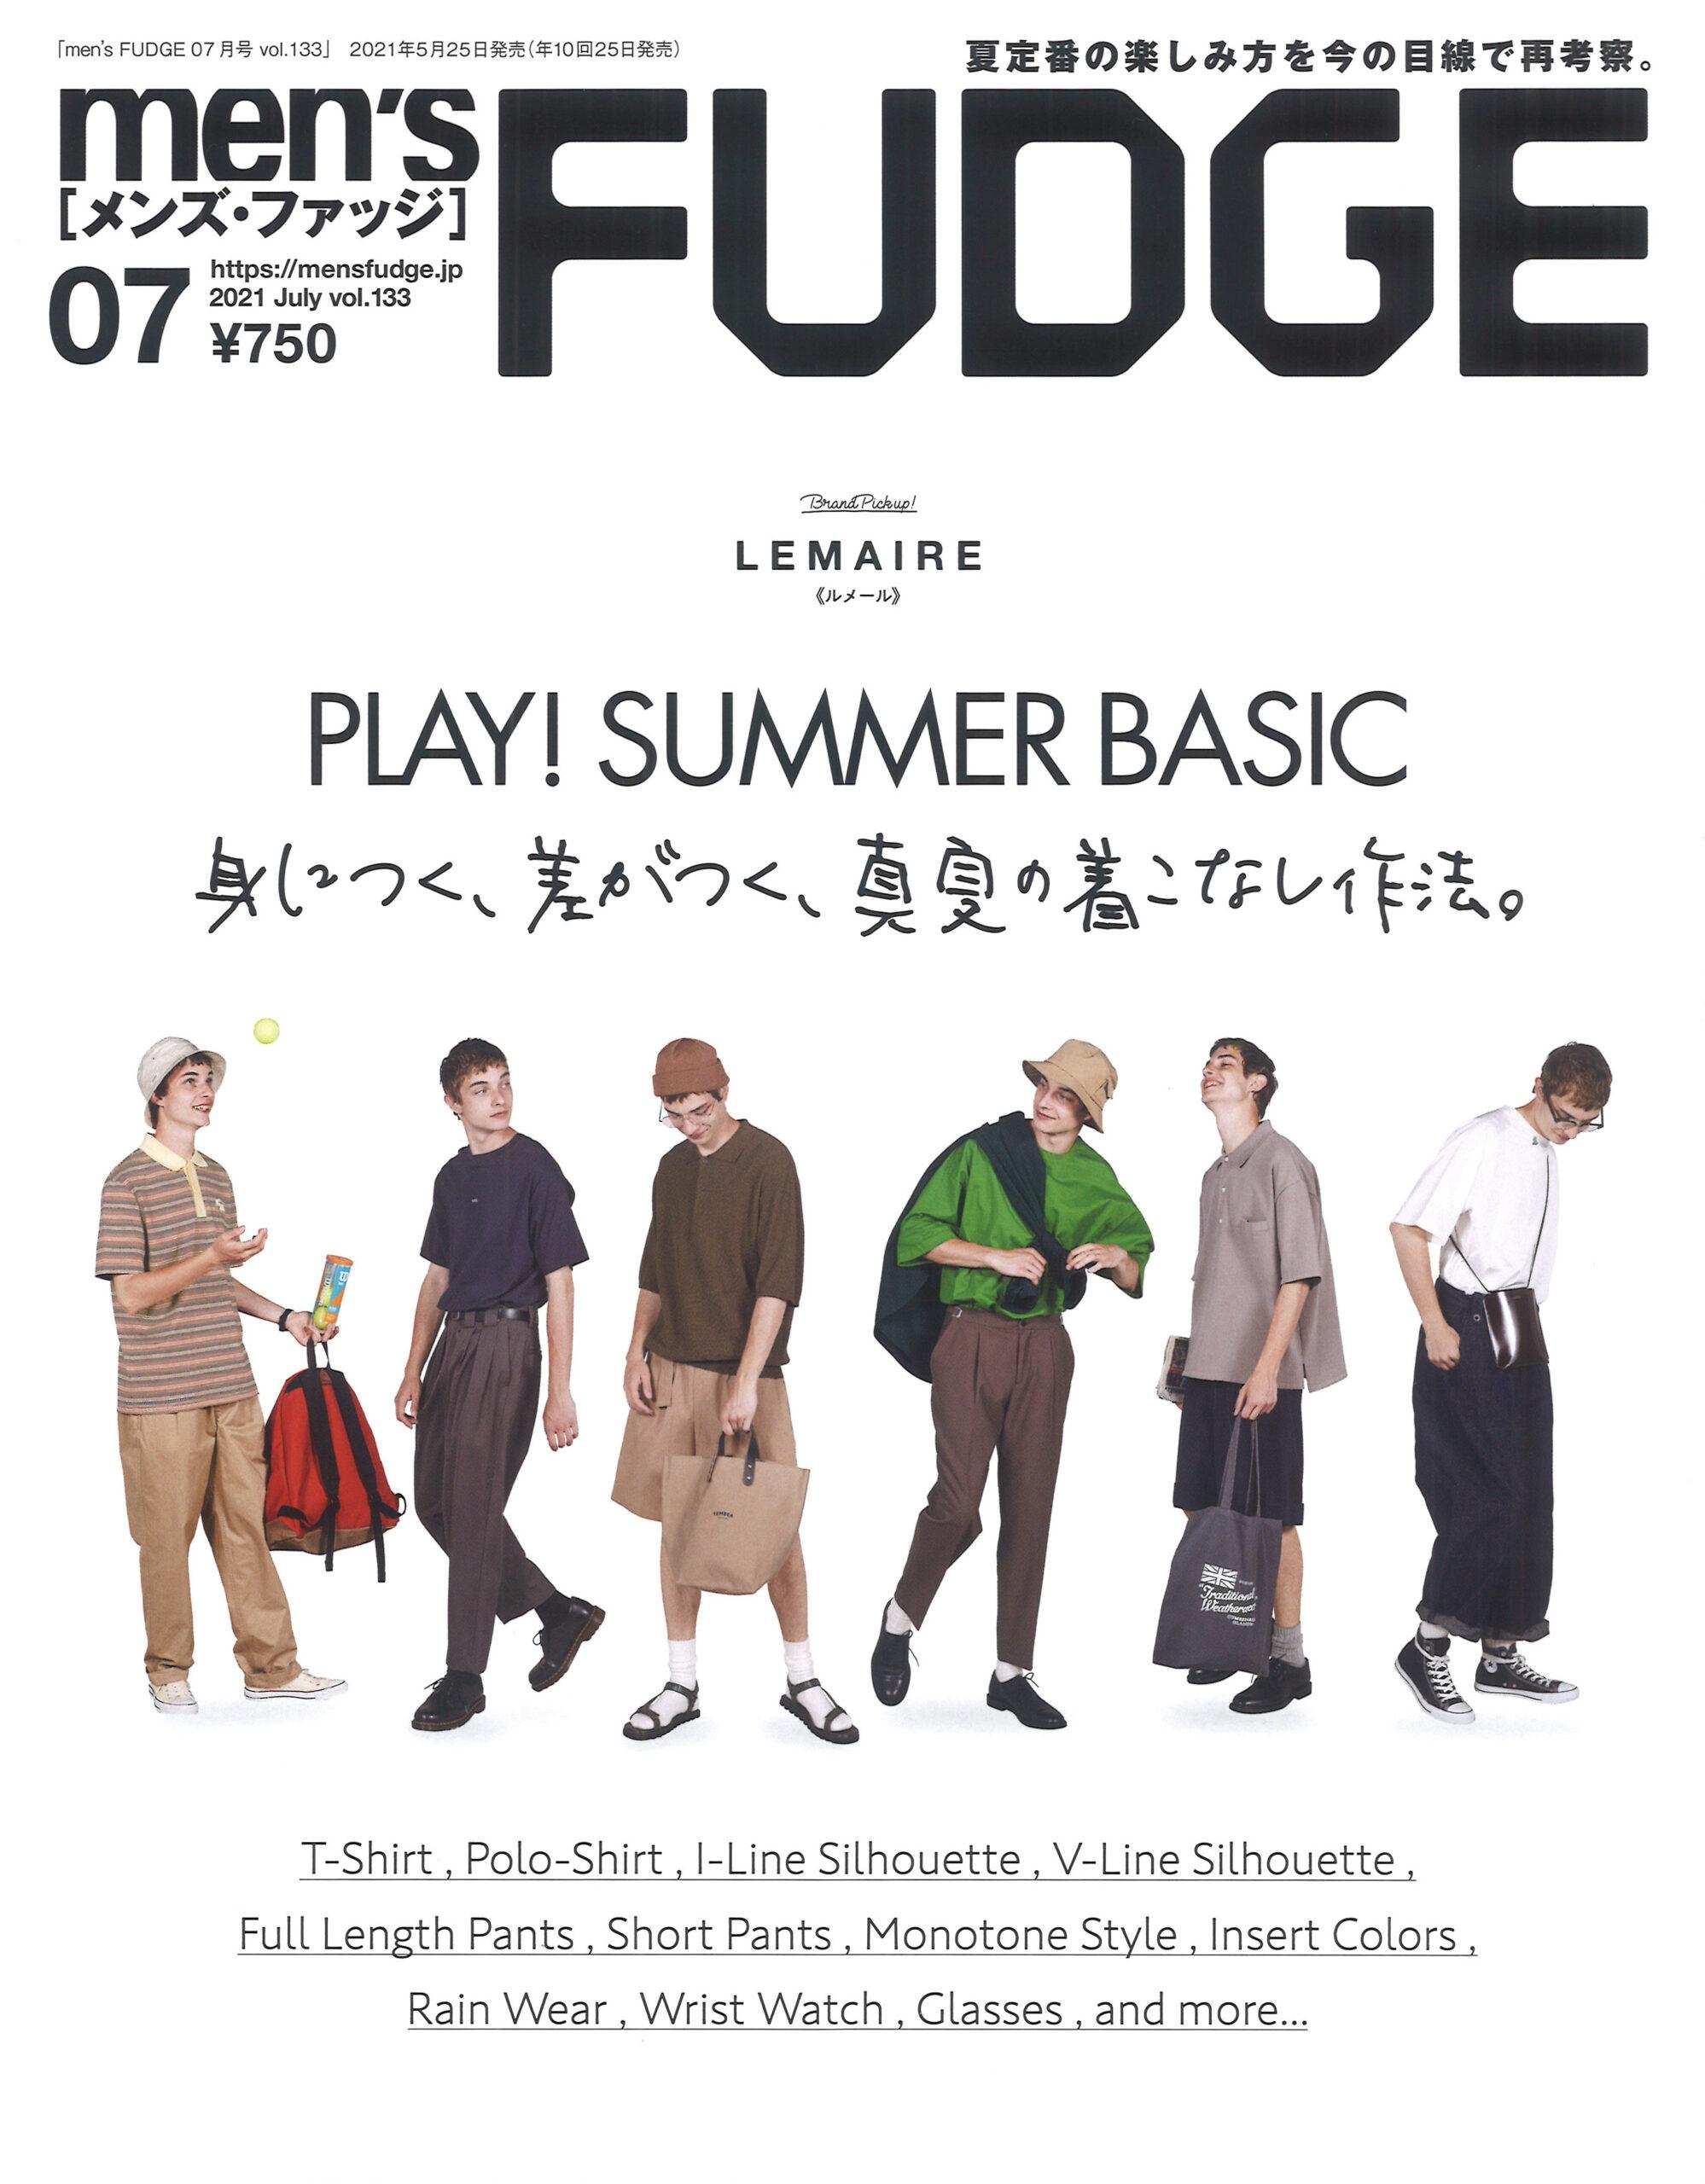 FUDGE-1912-01.jpg